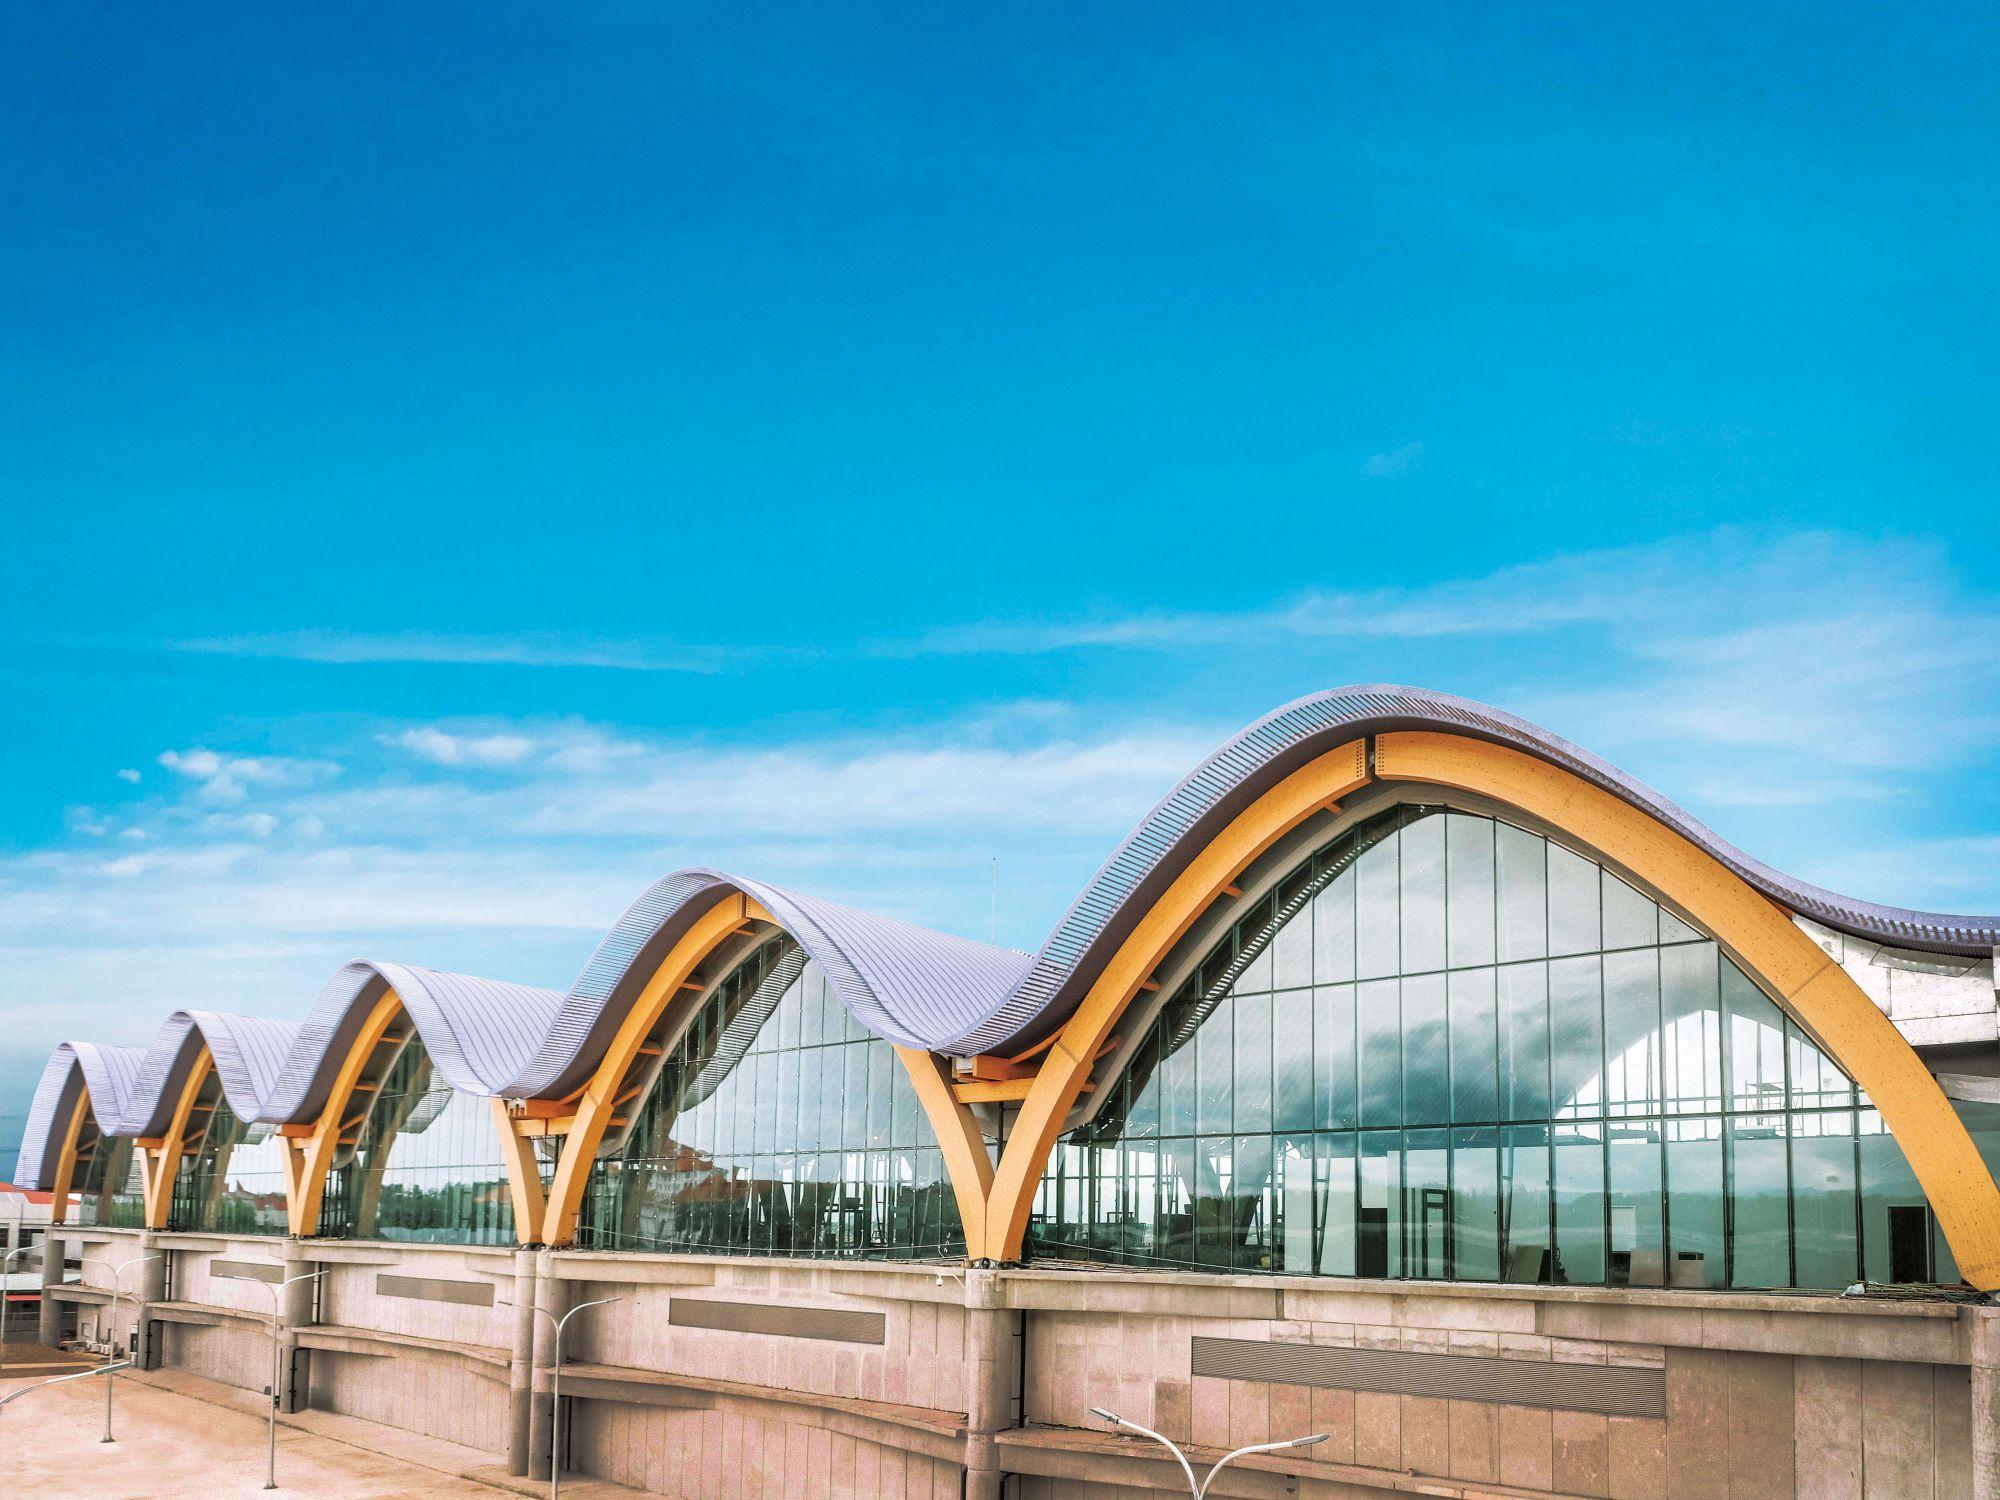 When Ideas Take Flight: A Look At The New Mactan Cebu International Airport